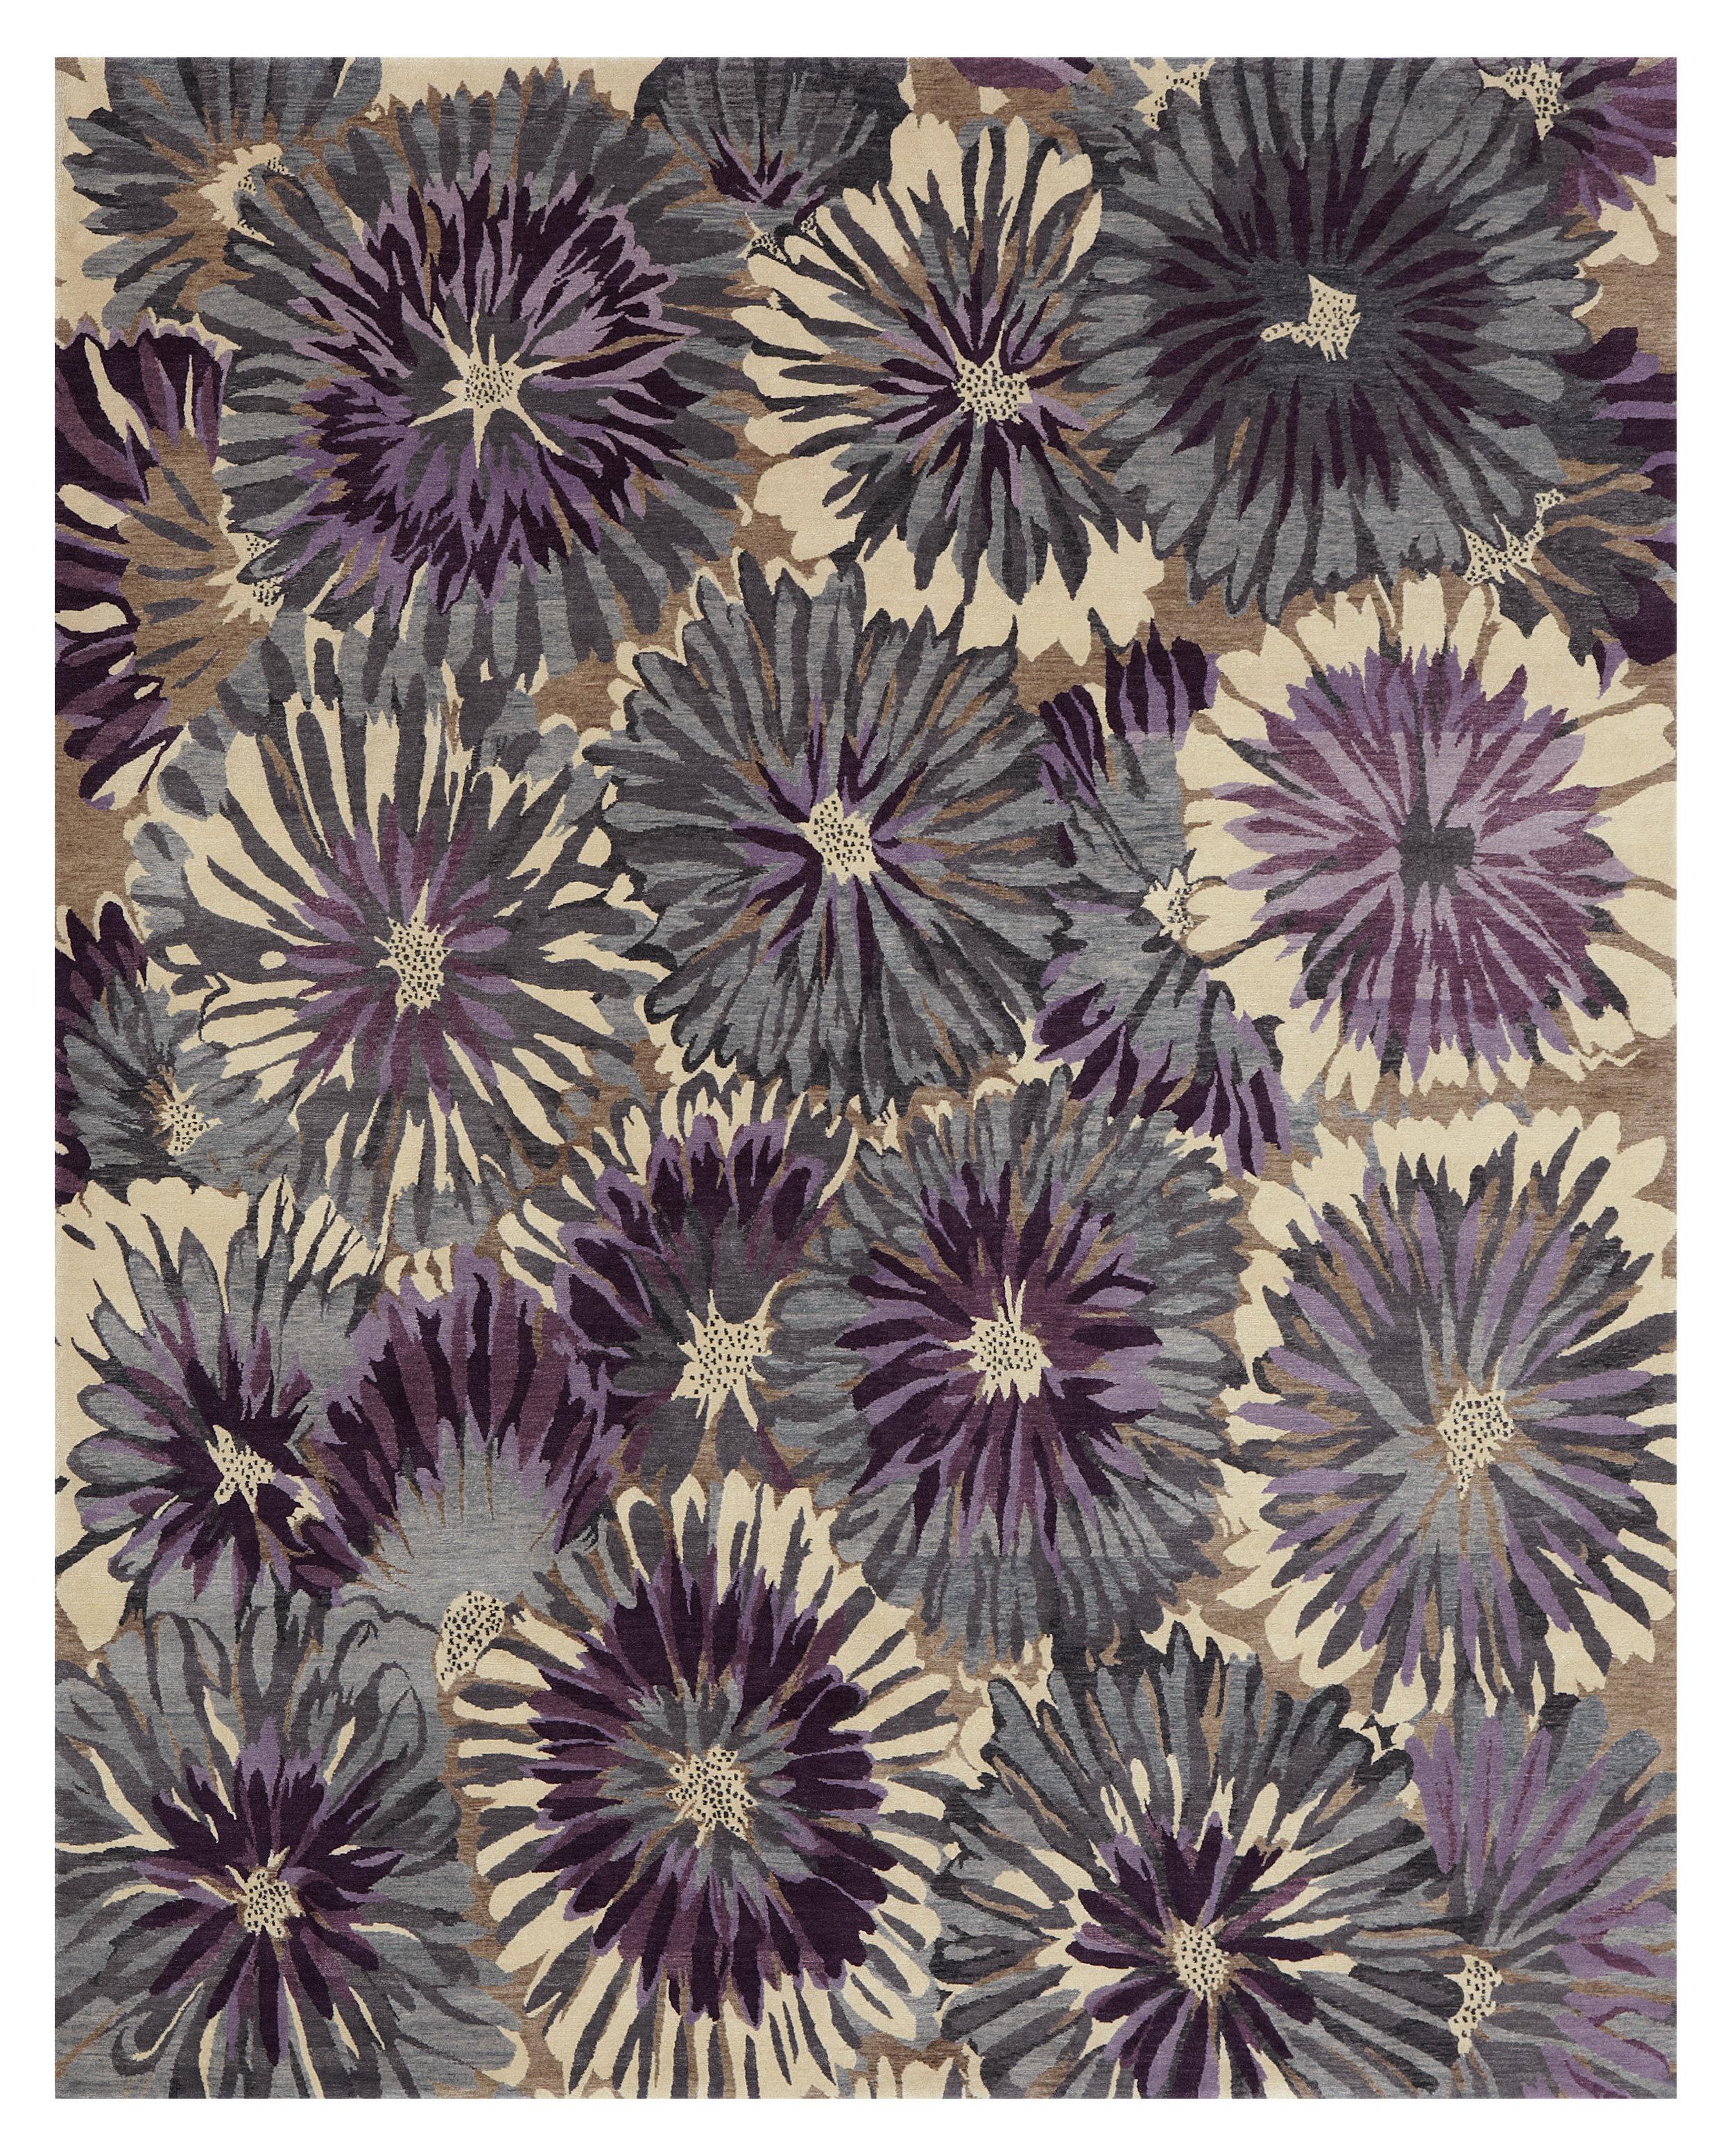 Sunburst Lavender